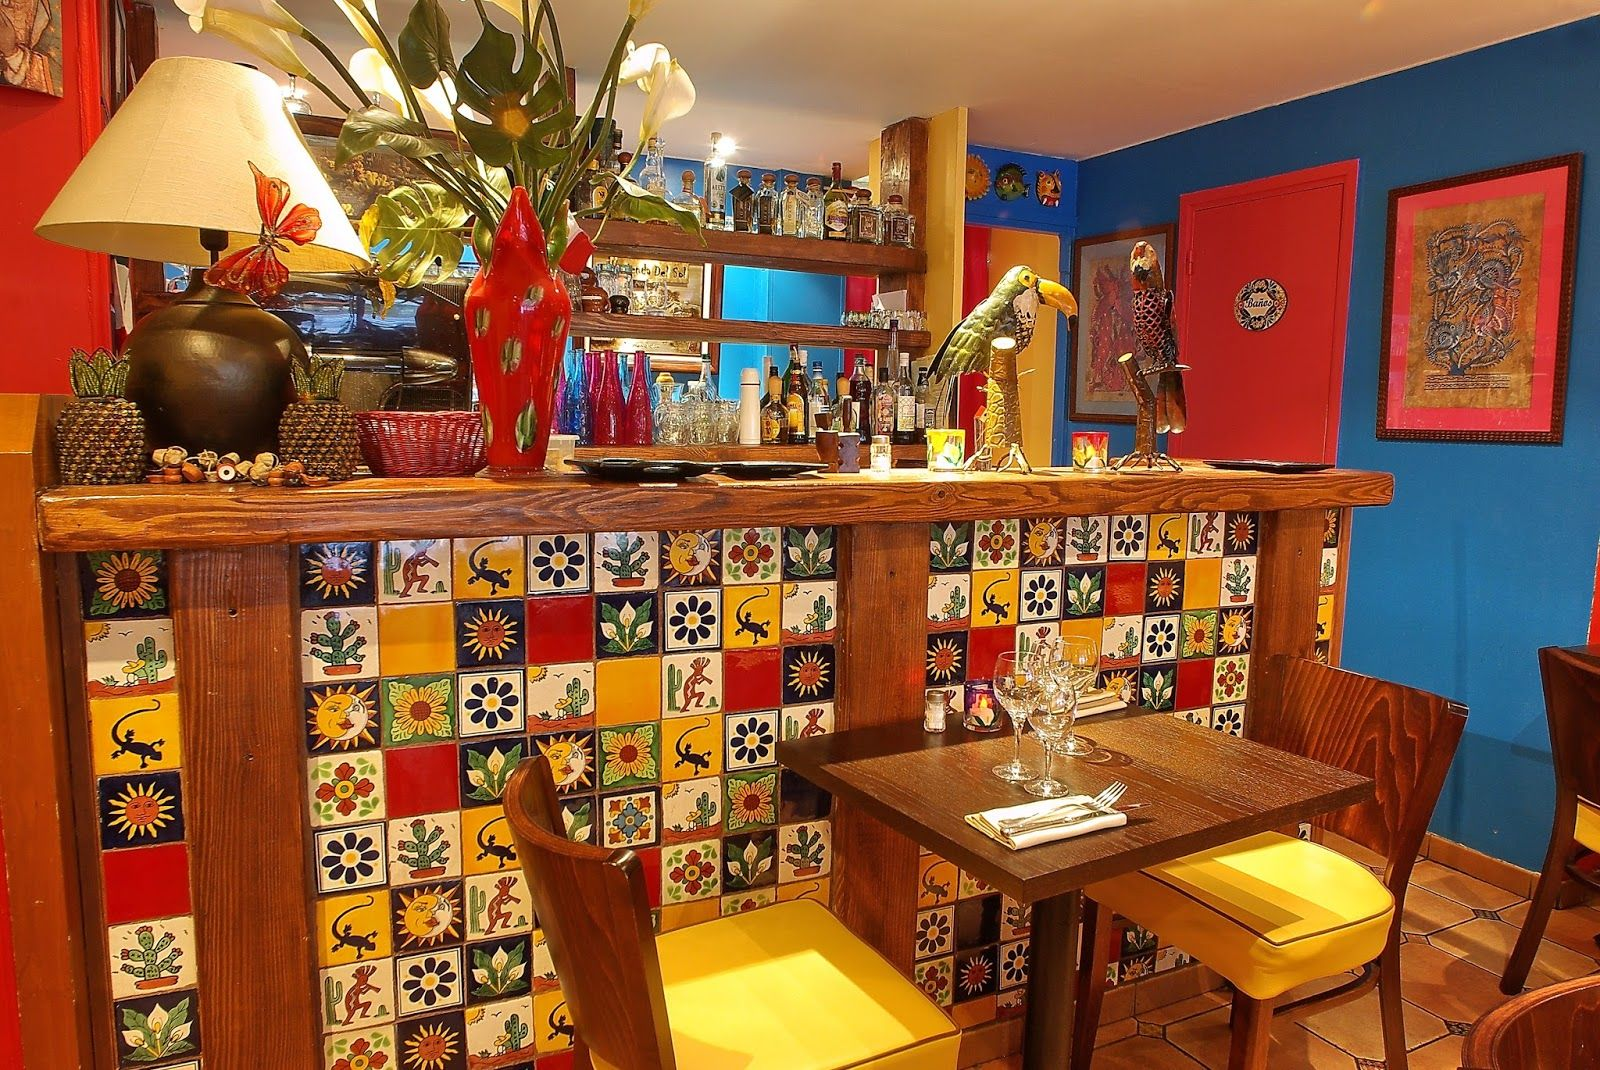 amadera les azulejos mexicains d corent le bar d 39 un restaurant mexicain paris azulejos. Black Bedroom Furniture Sets. Home Design Ideas